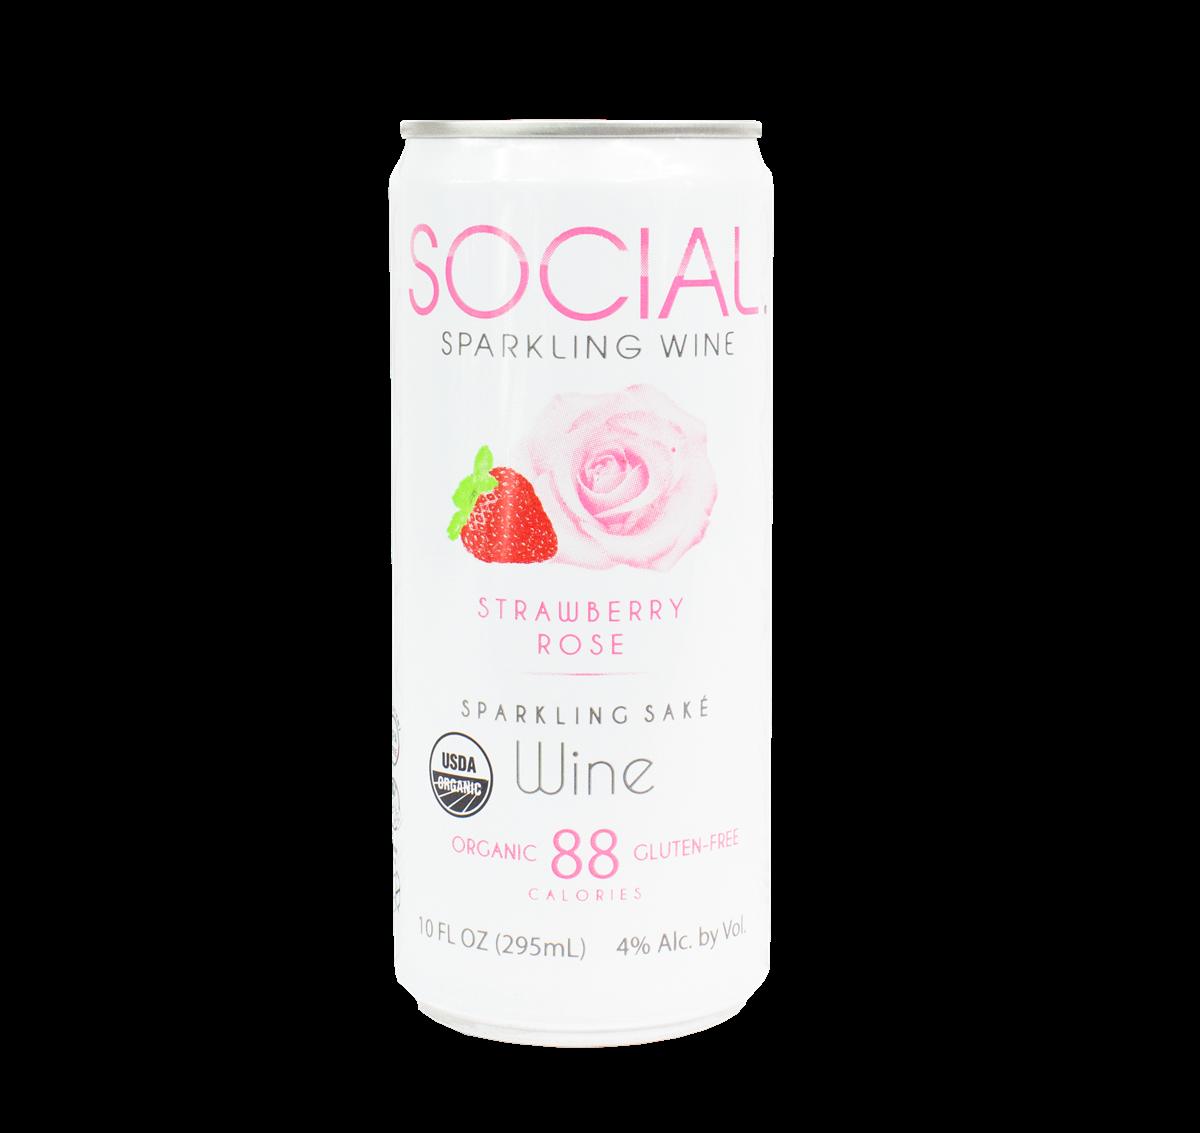 SOCIAL Strawberry Rose Sparkling Wine